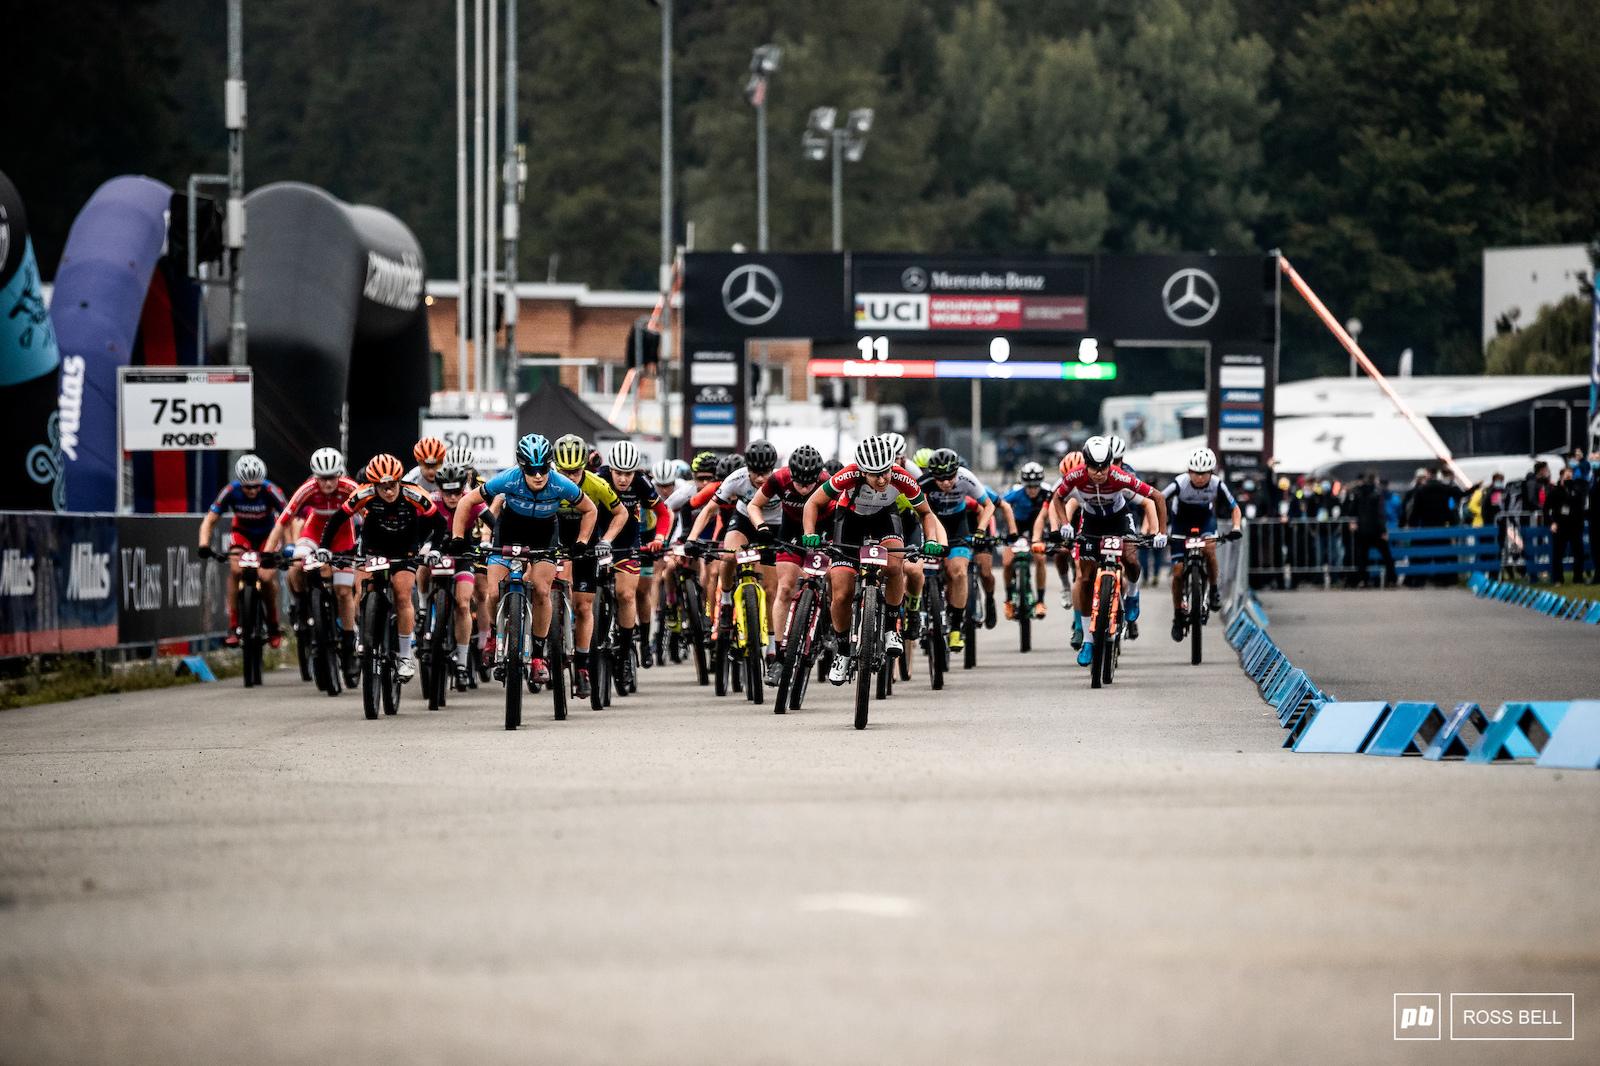 The U23 women kick off the XCO racing action here in Nove Mesto.